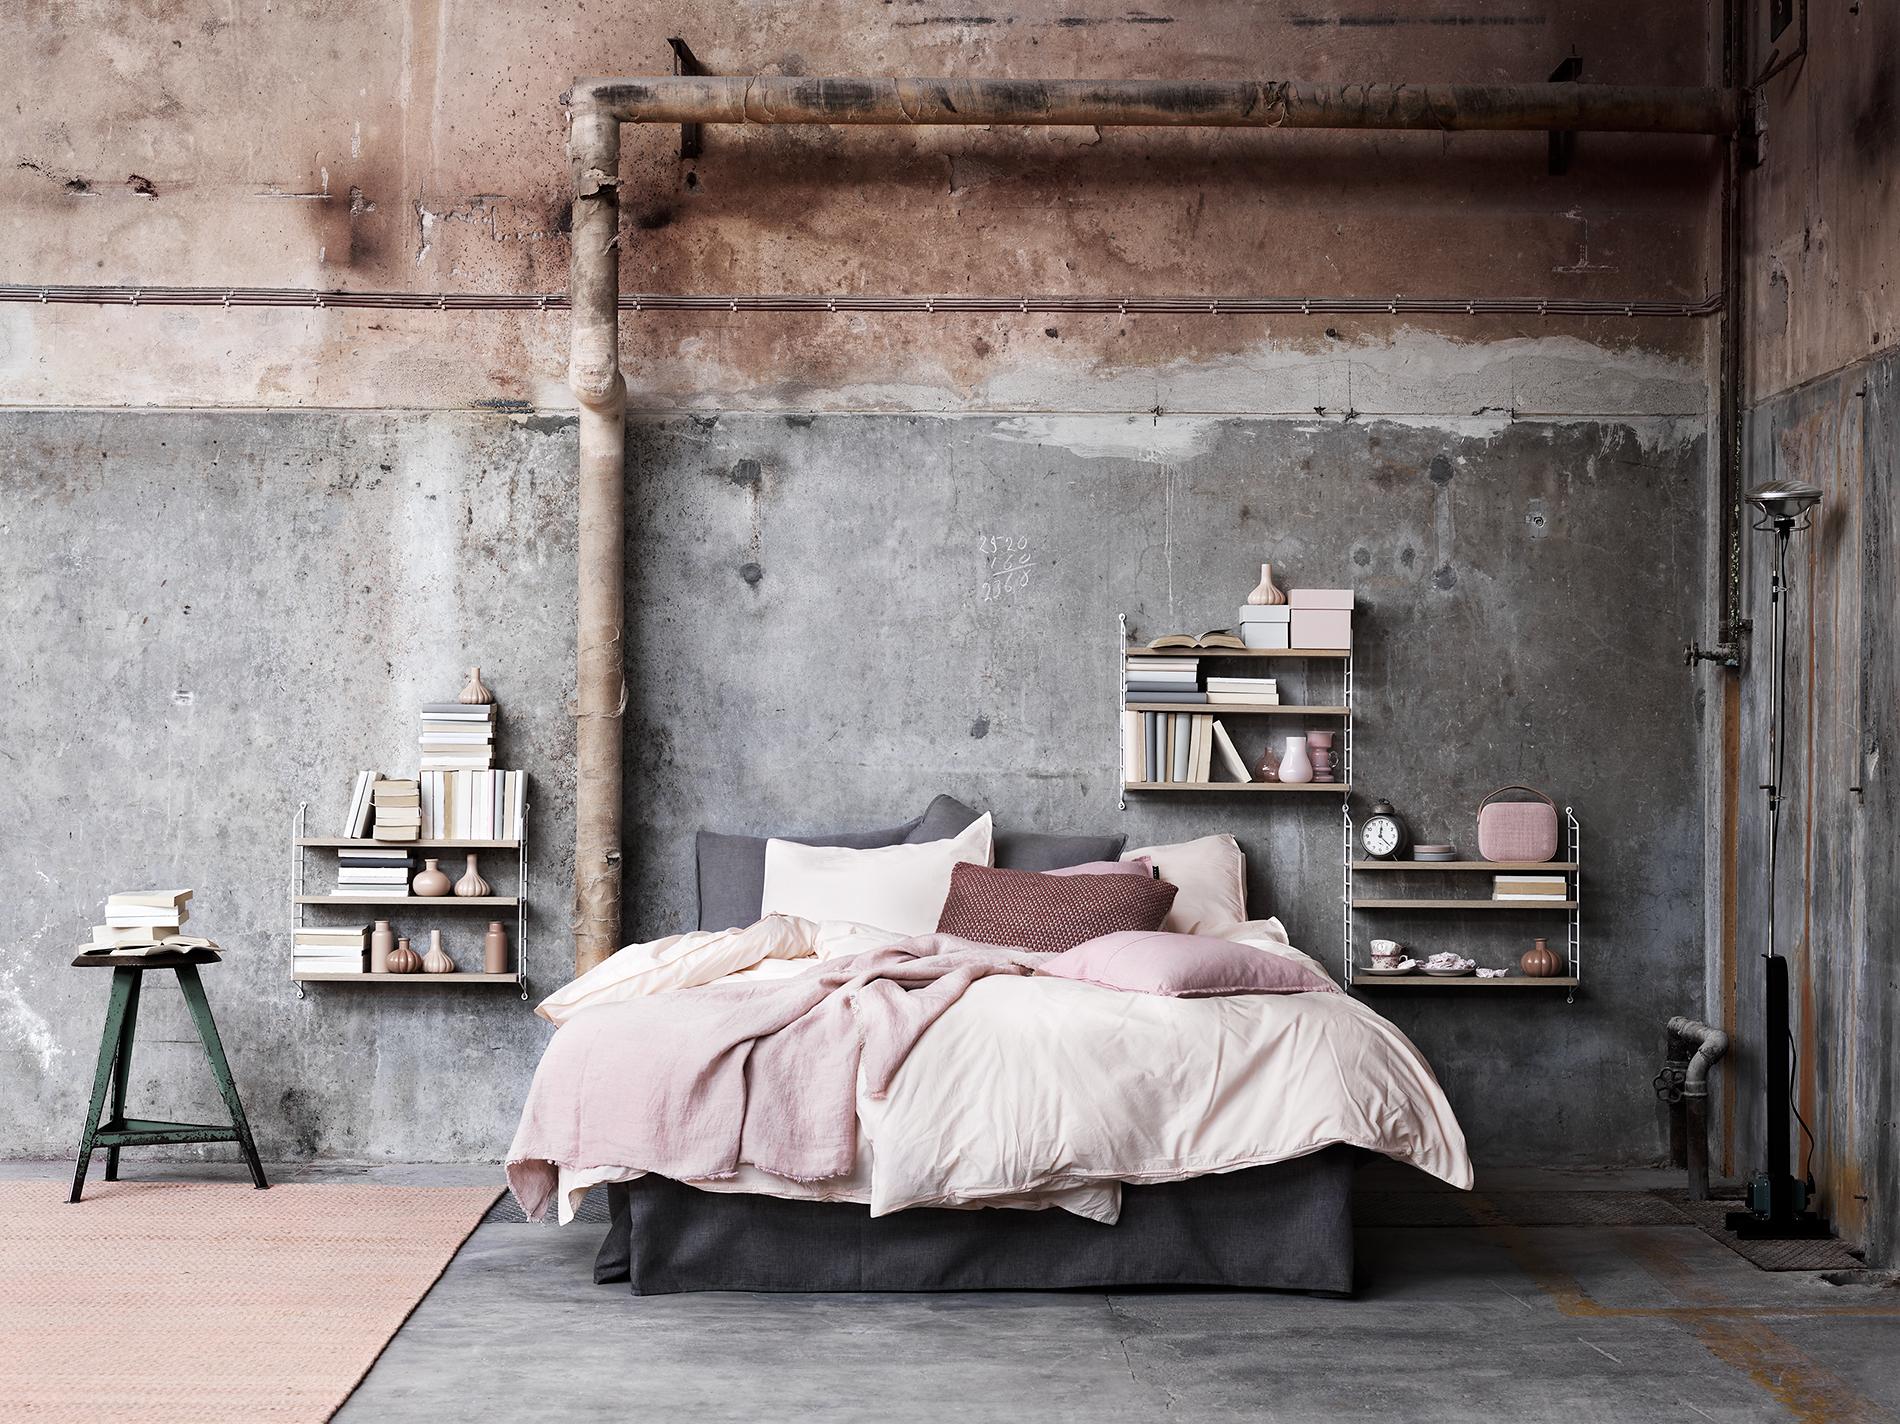 String_2016_Lotta_Agaton concrete bedroom